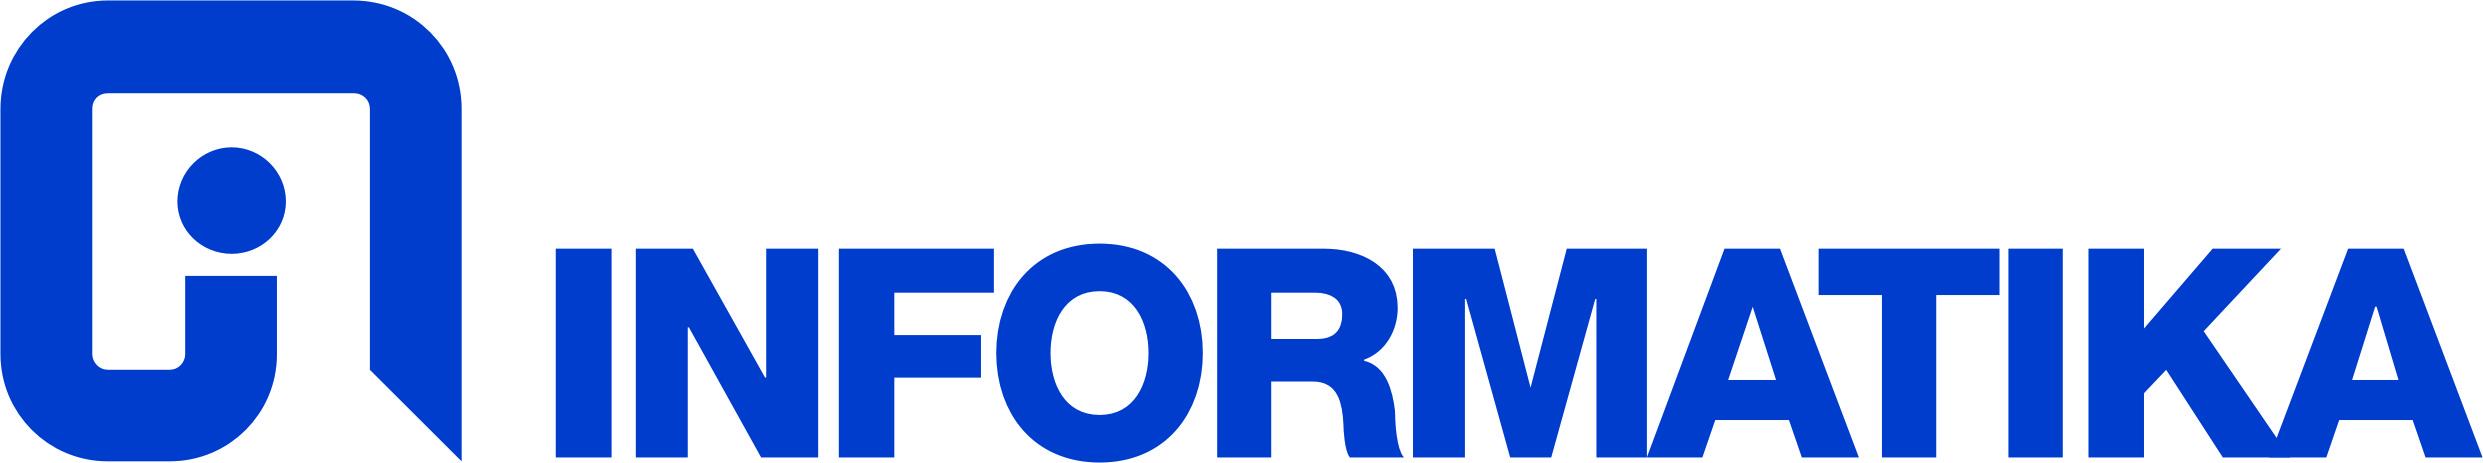 informatika_logo-10070020